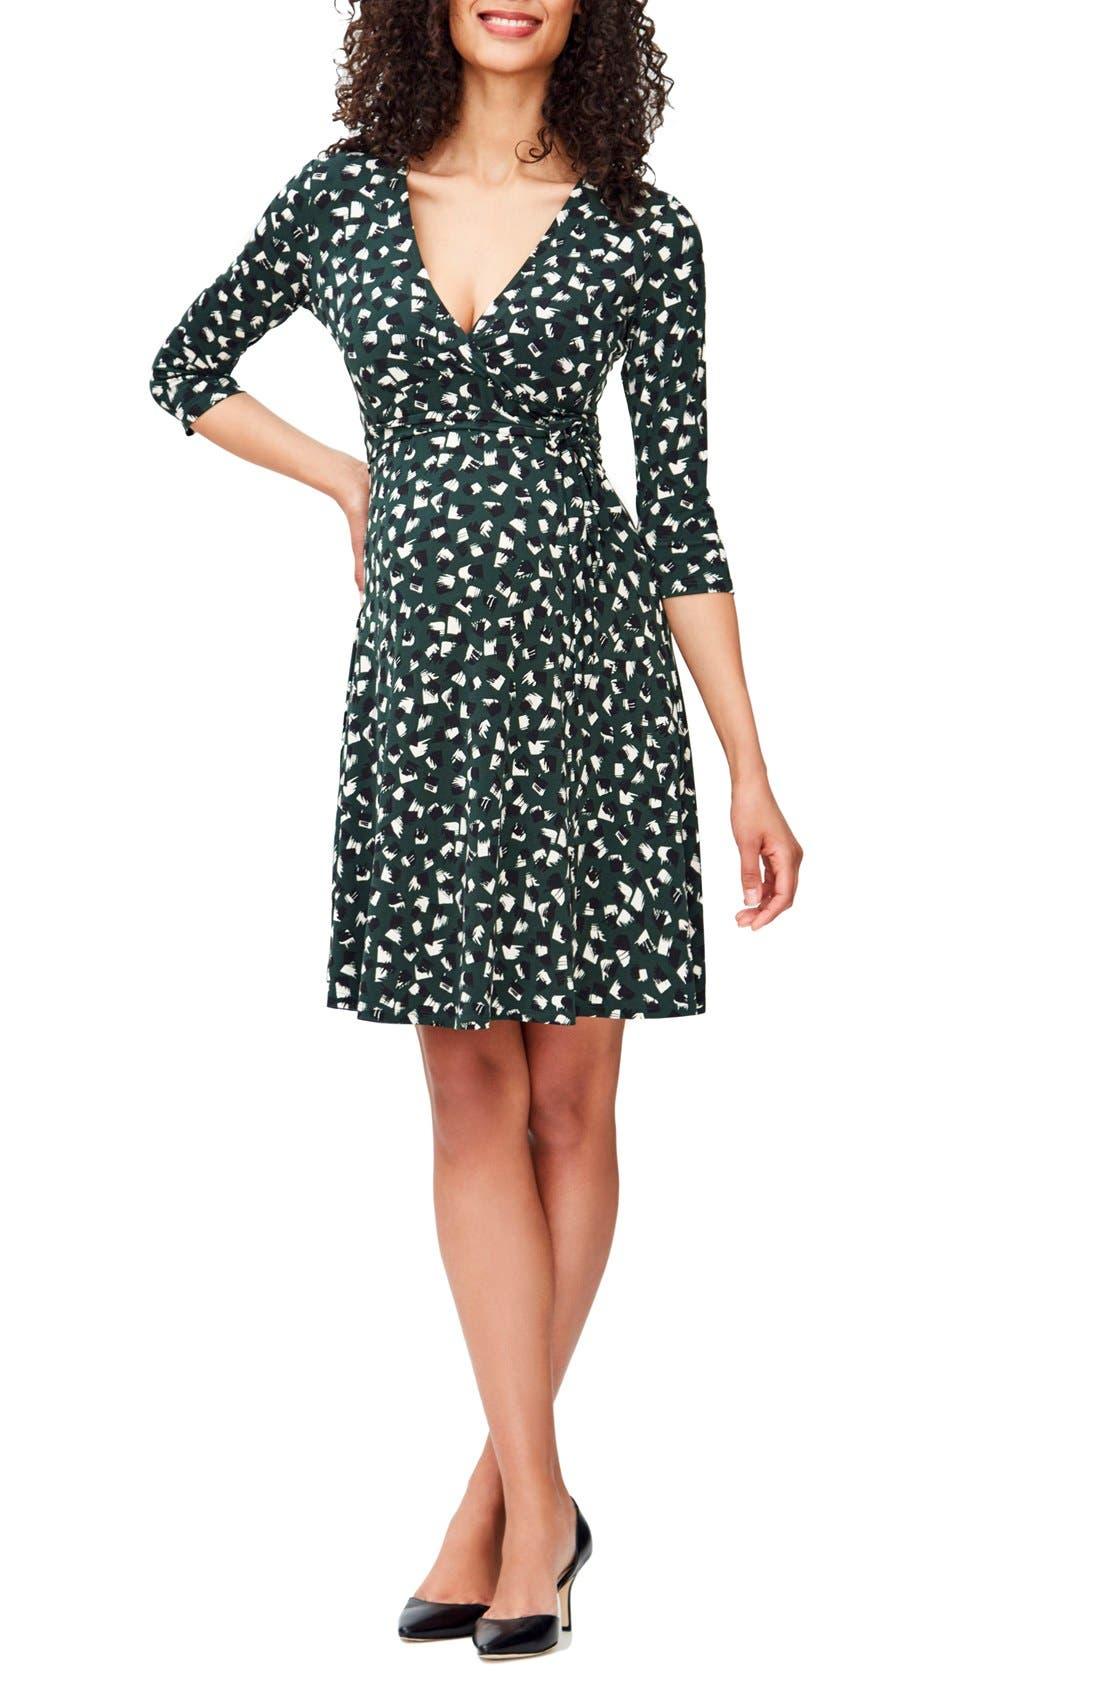 Leota 'Perfect Wrap' Maternity Dress